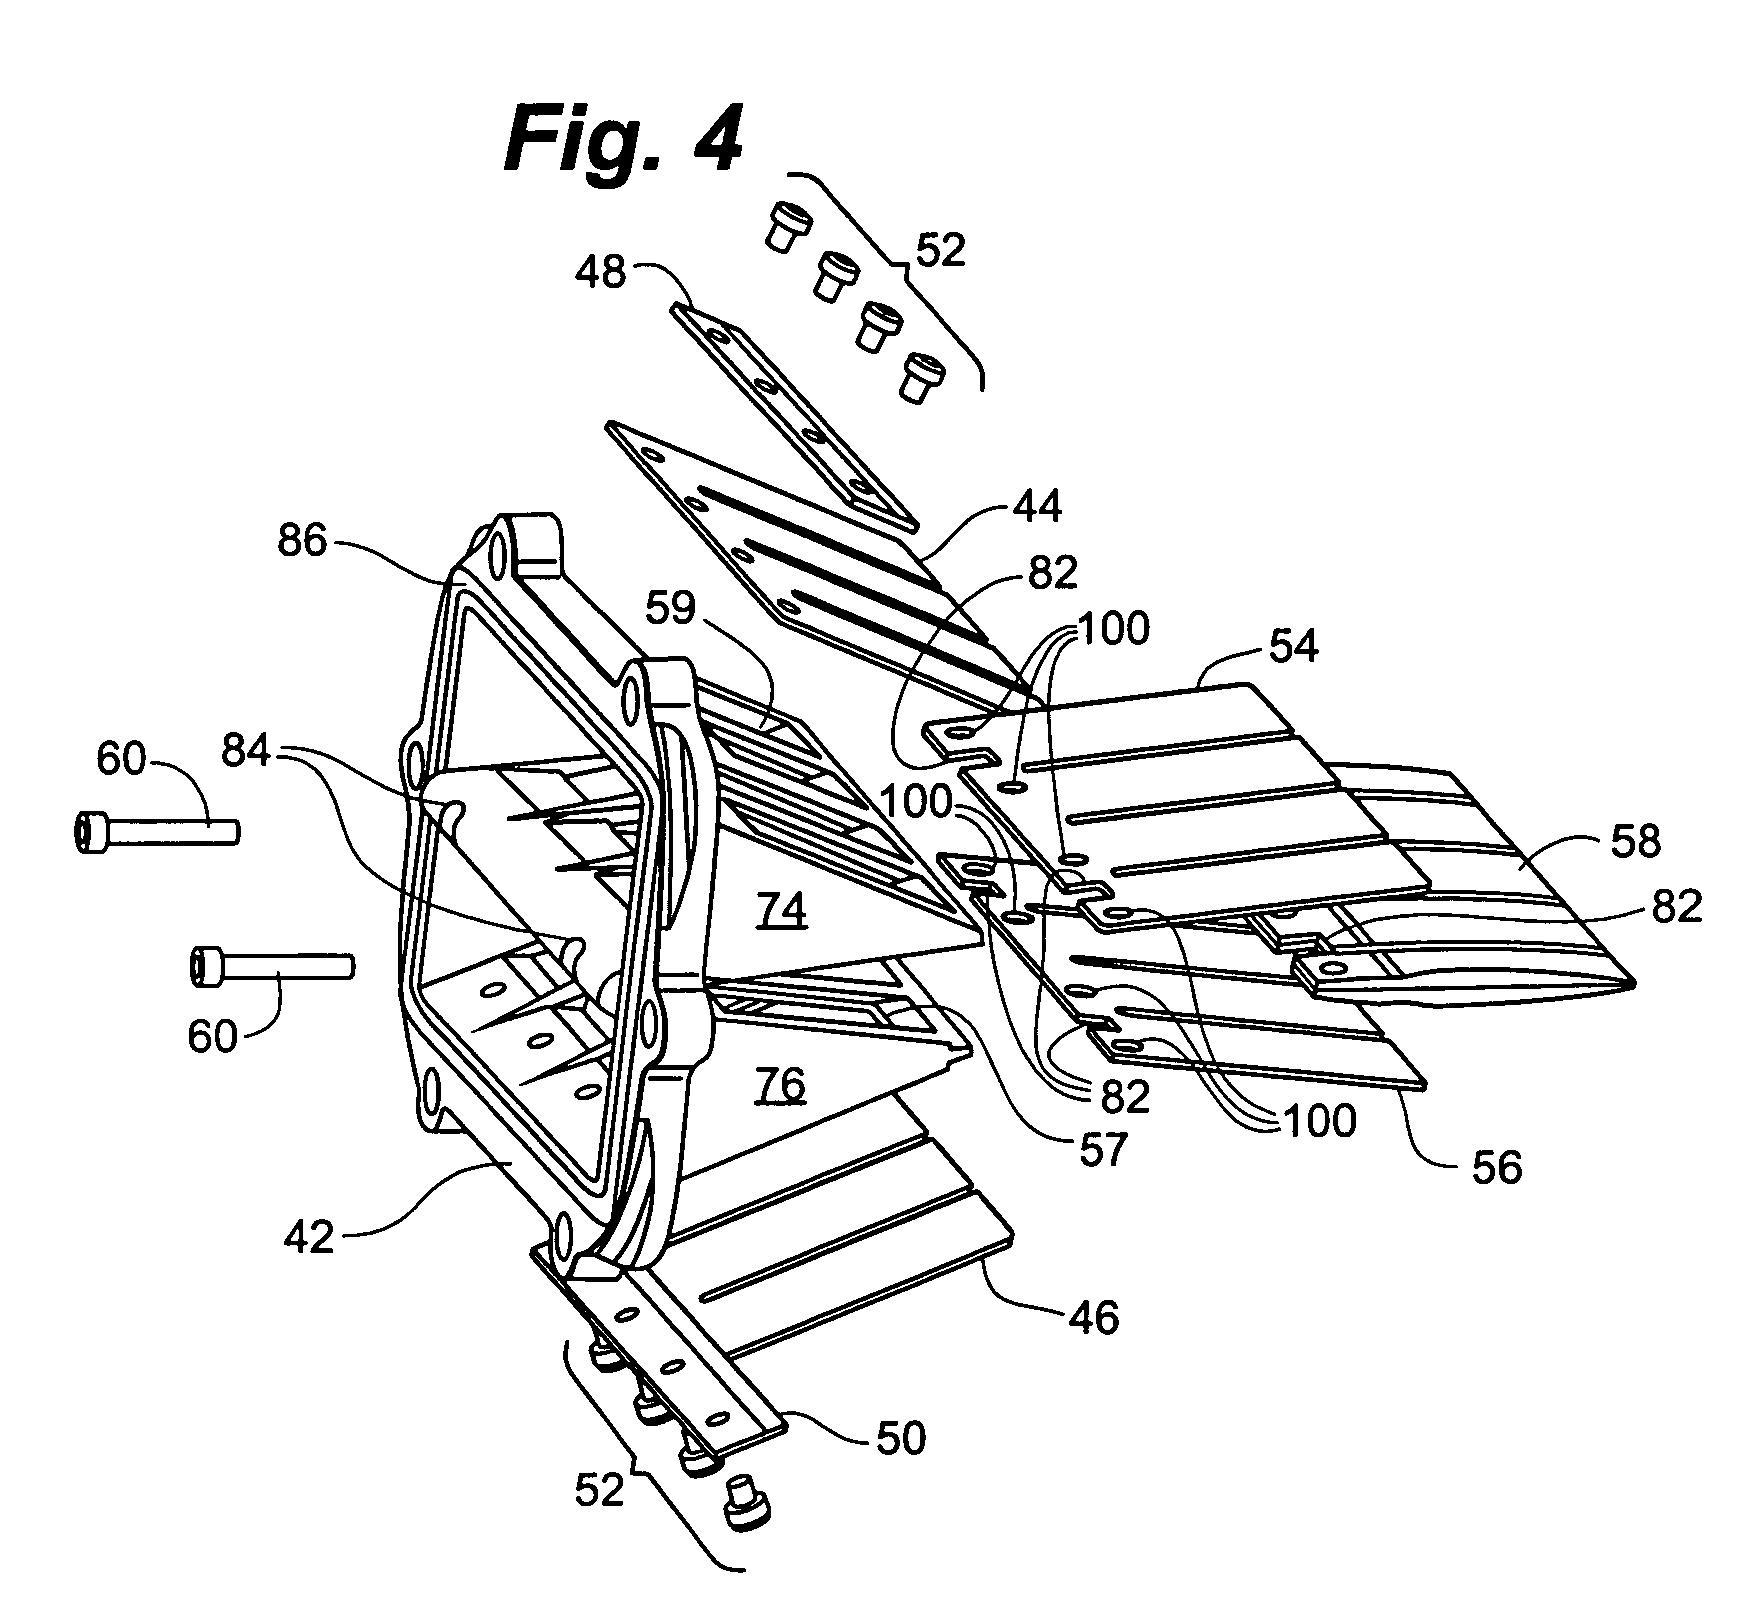 triton r4 wiring diagram 50cc